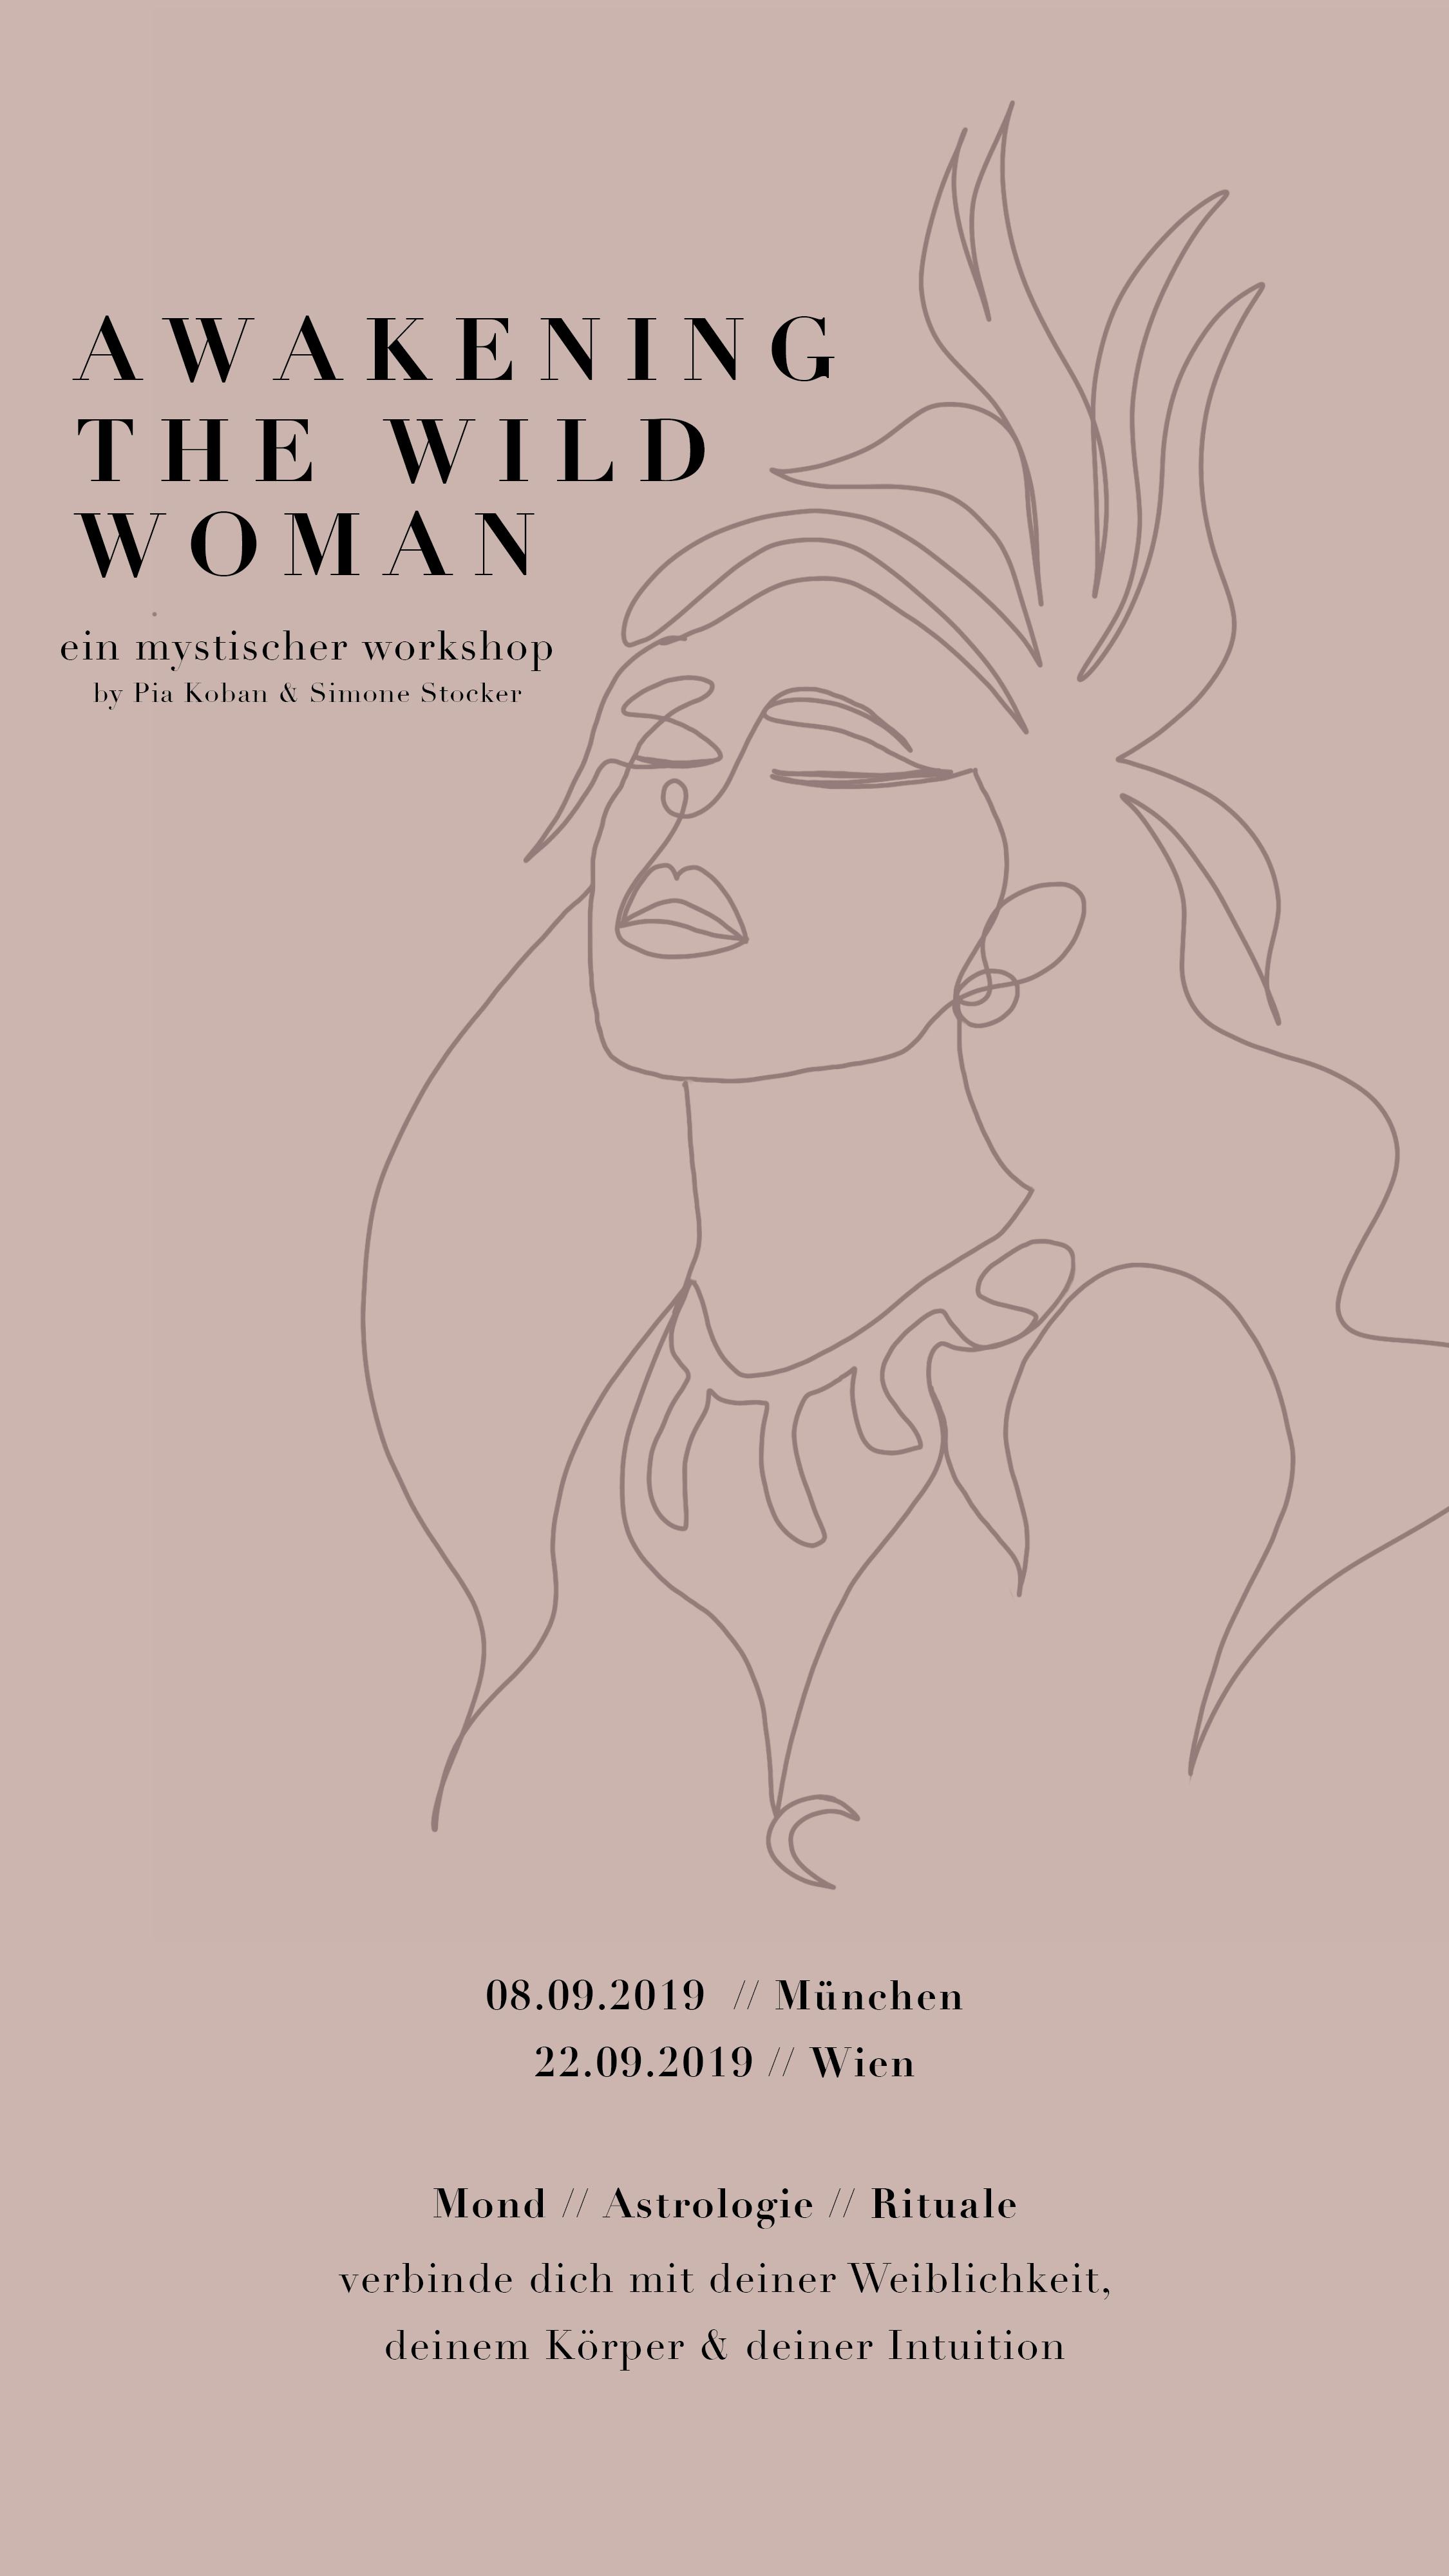 By-Simone-Stocker_Flowers-Background_Awakening the Wild Woman Workshop